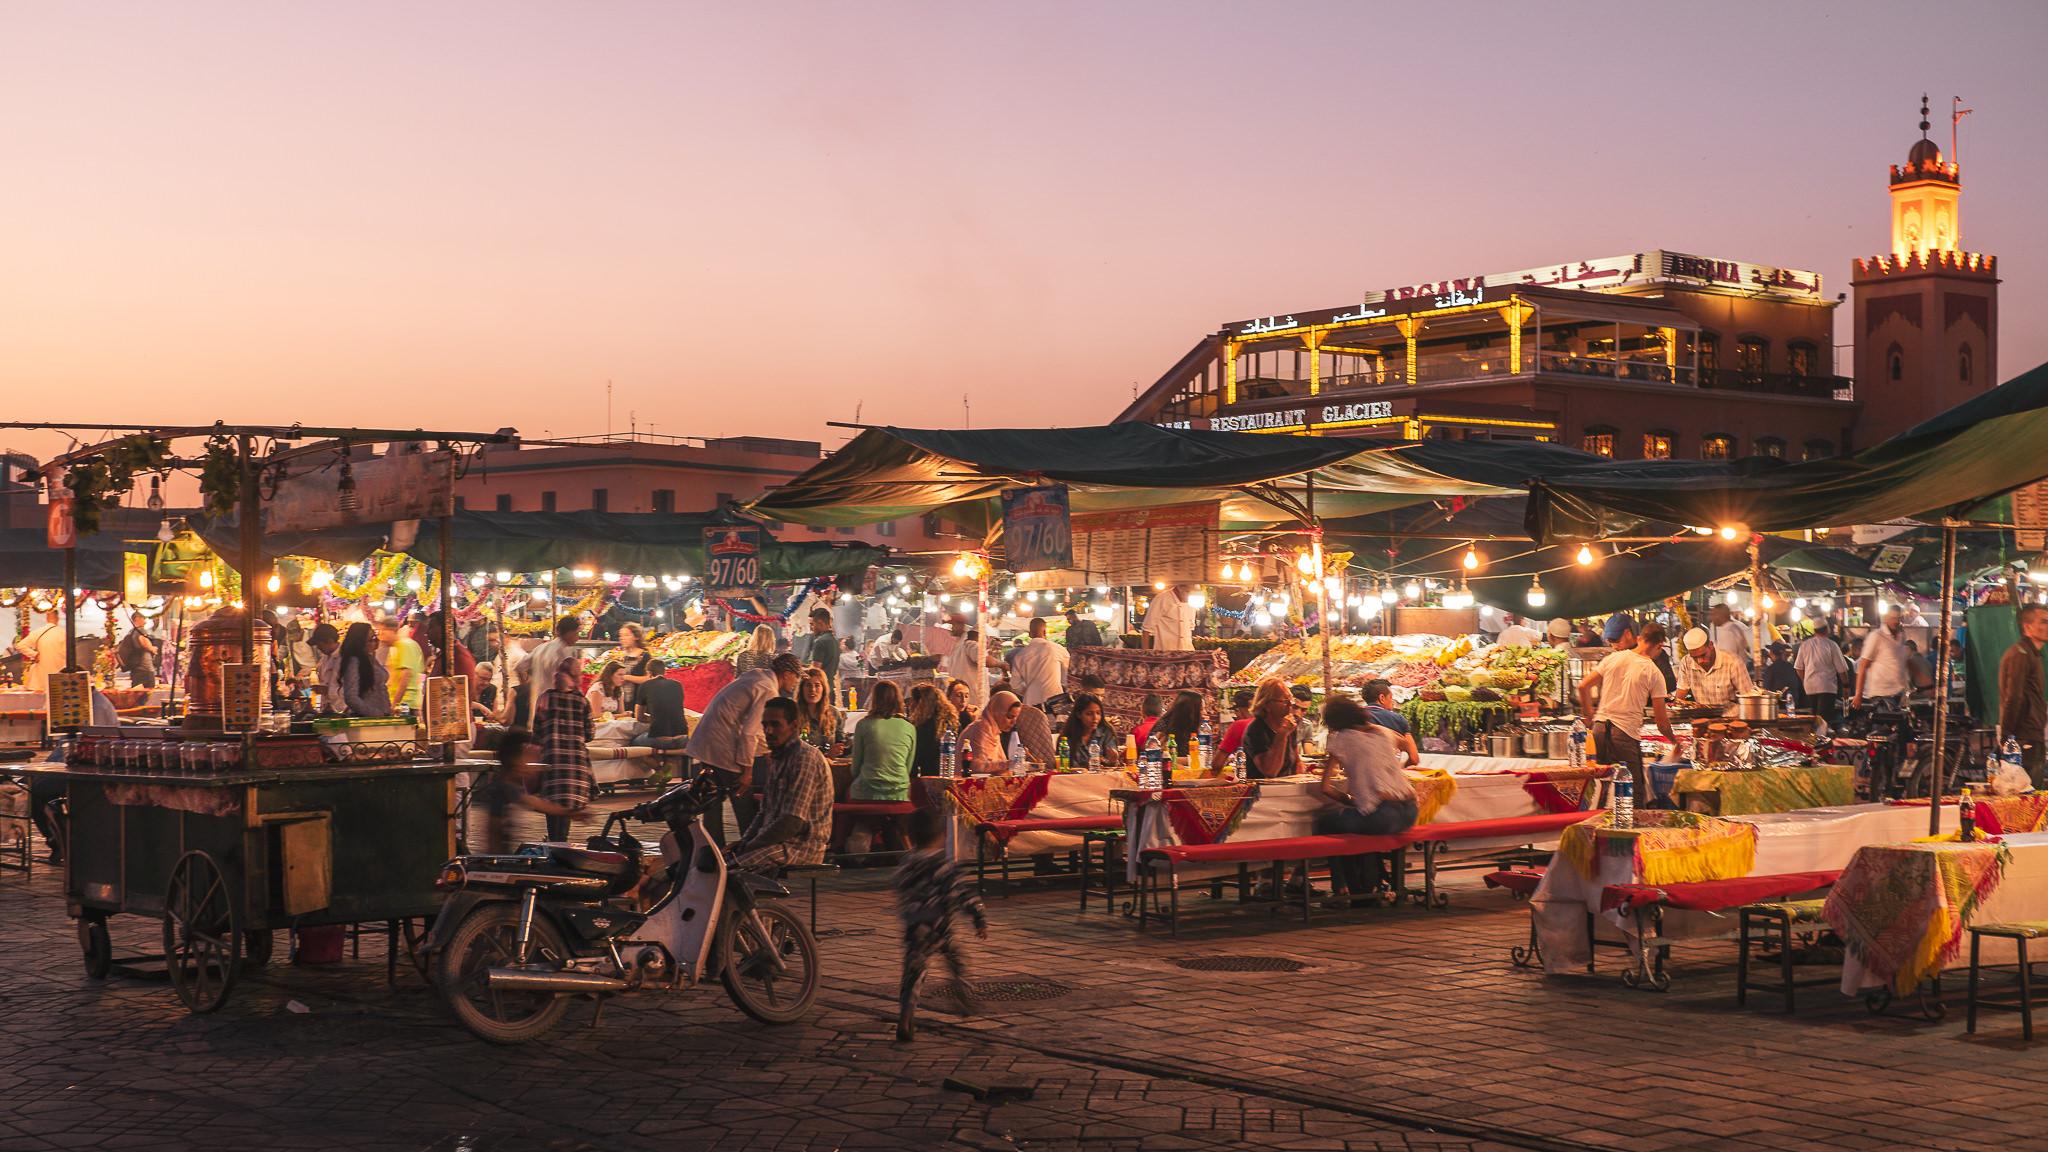 Marrakech souks at night during Ramadan